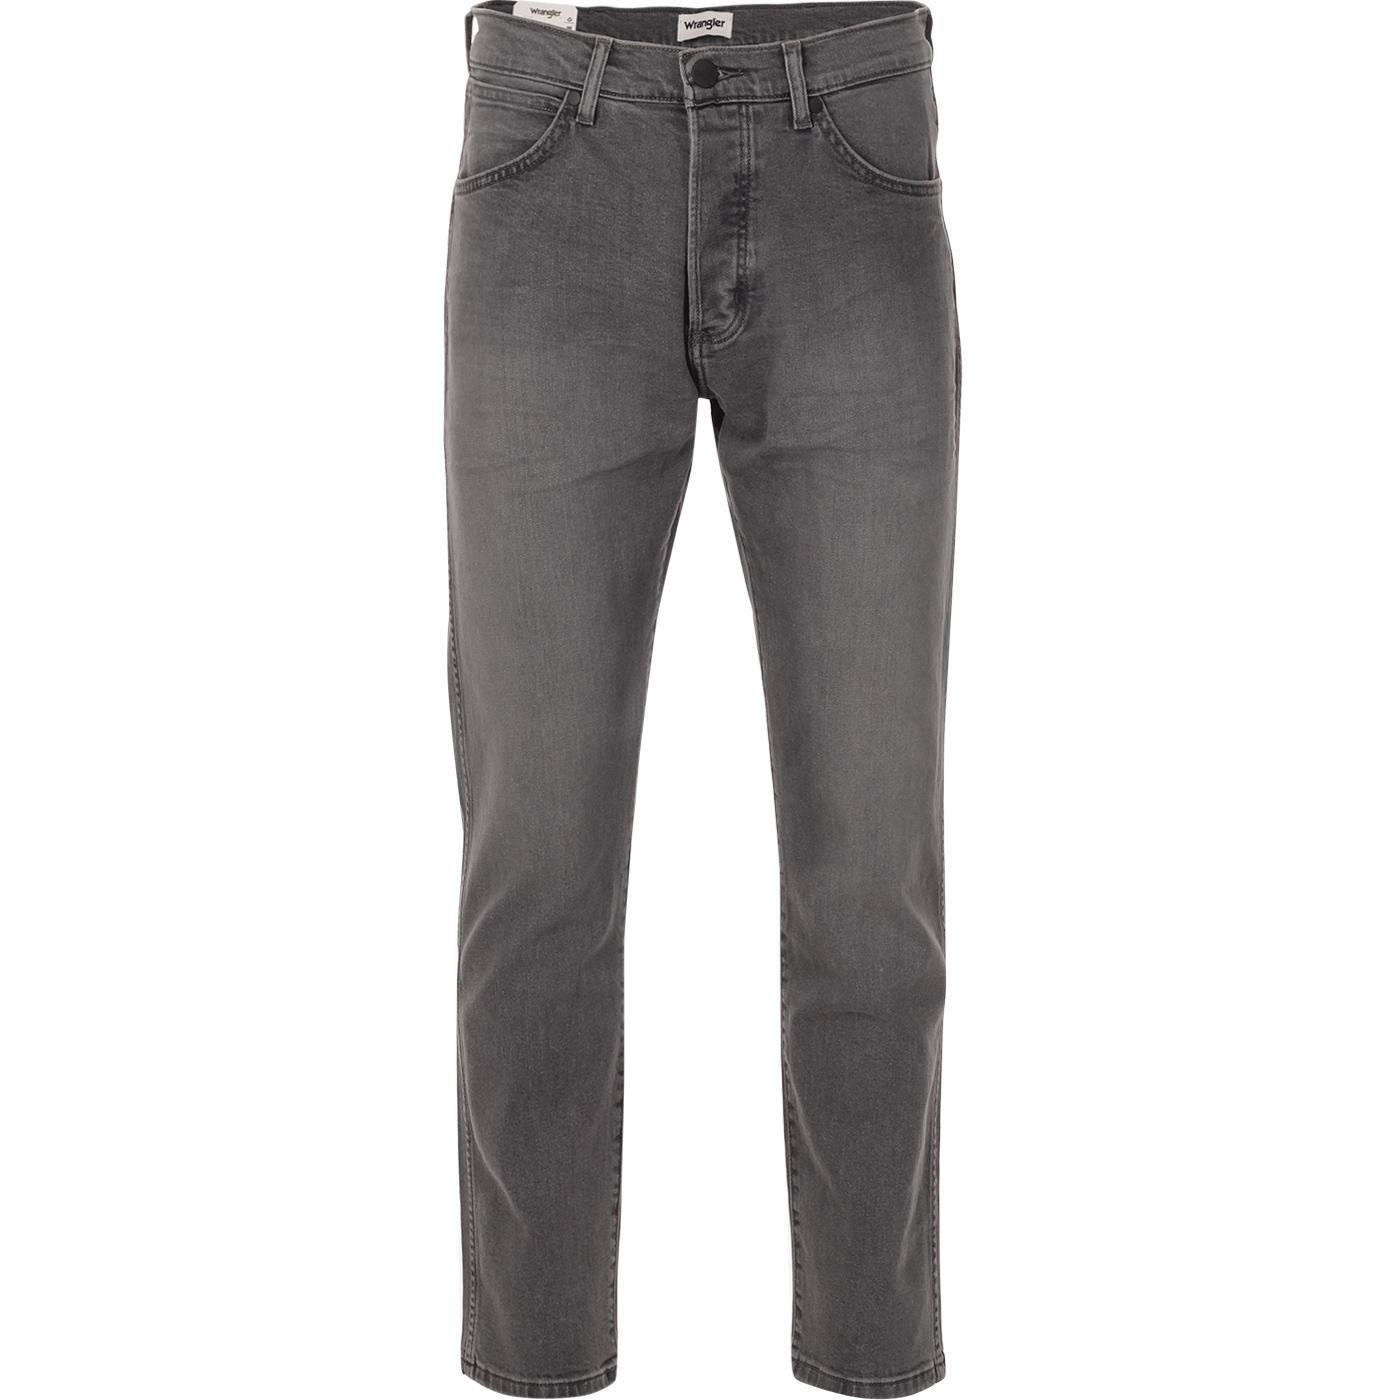 Slider WRANGLER Regular Taper Top Dog Jeans GREY